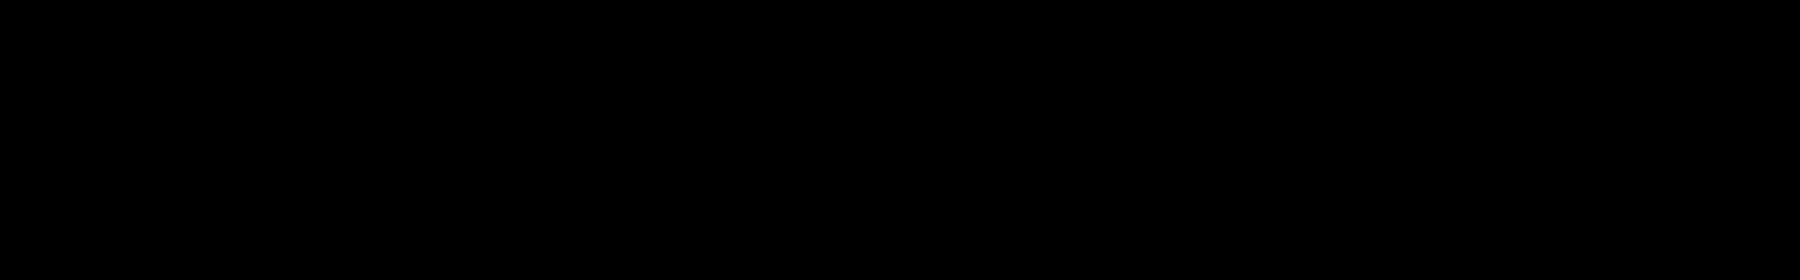 Tic Toc audio waveform